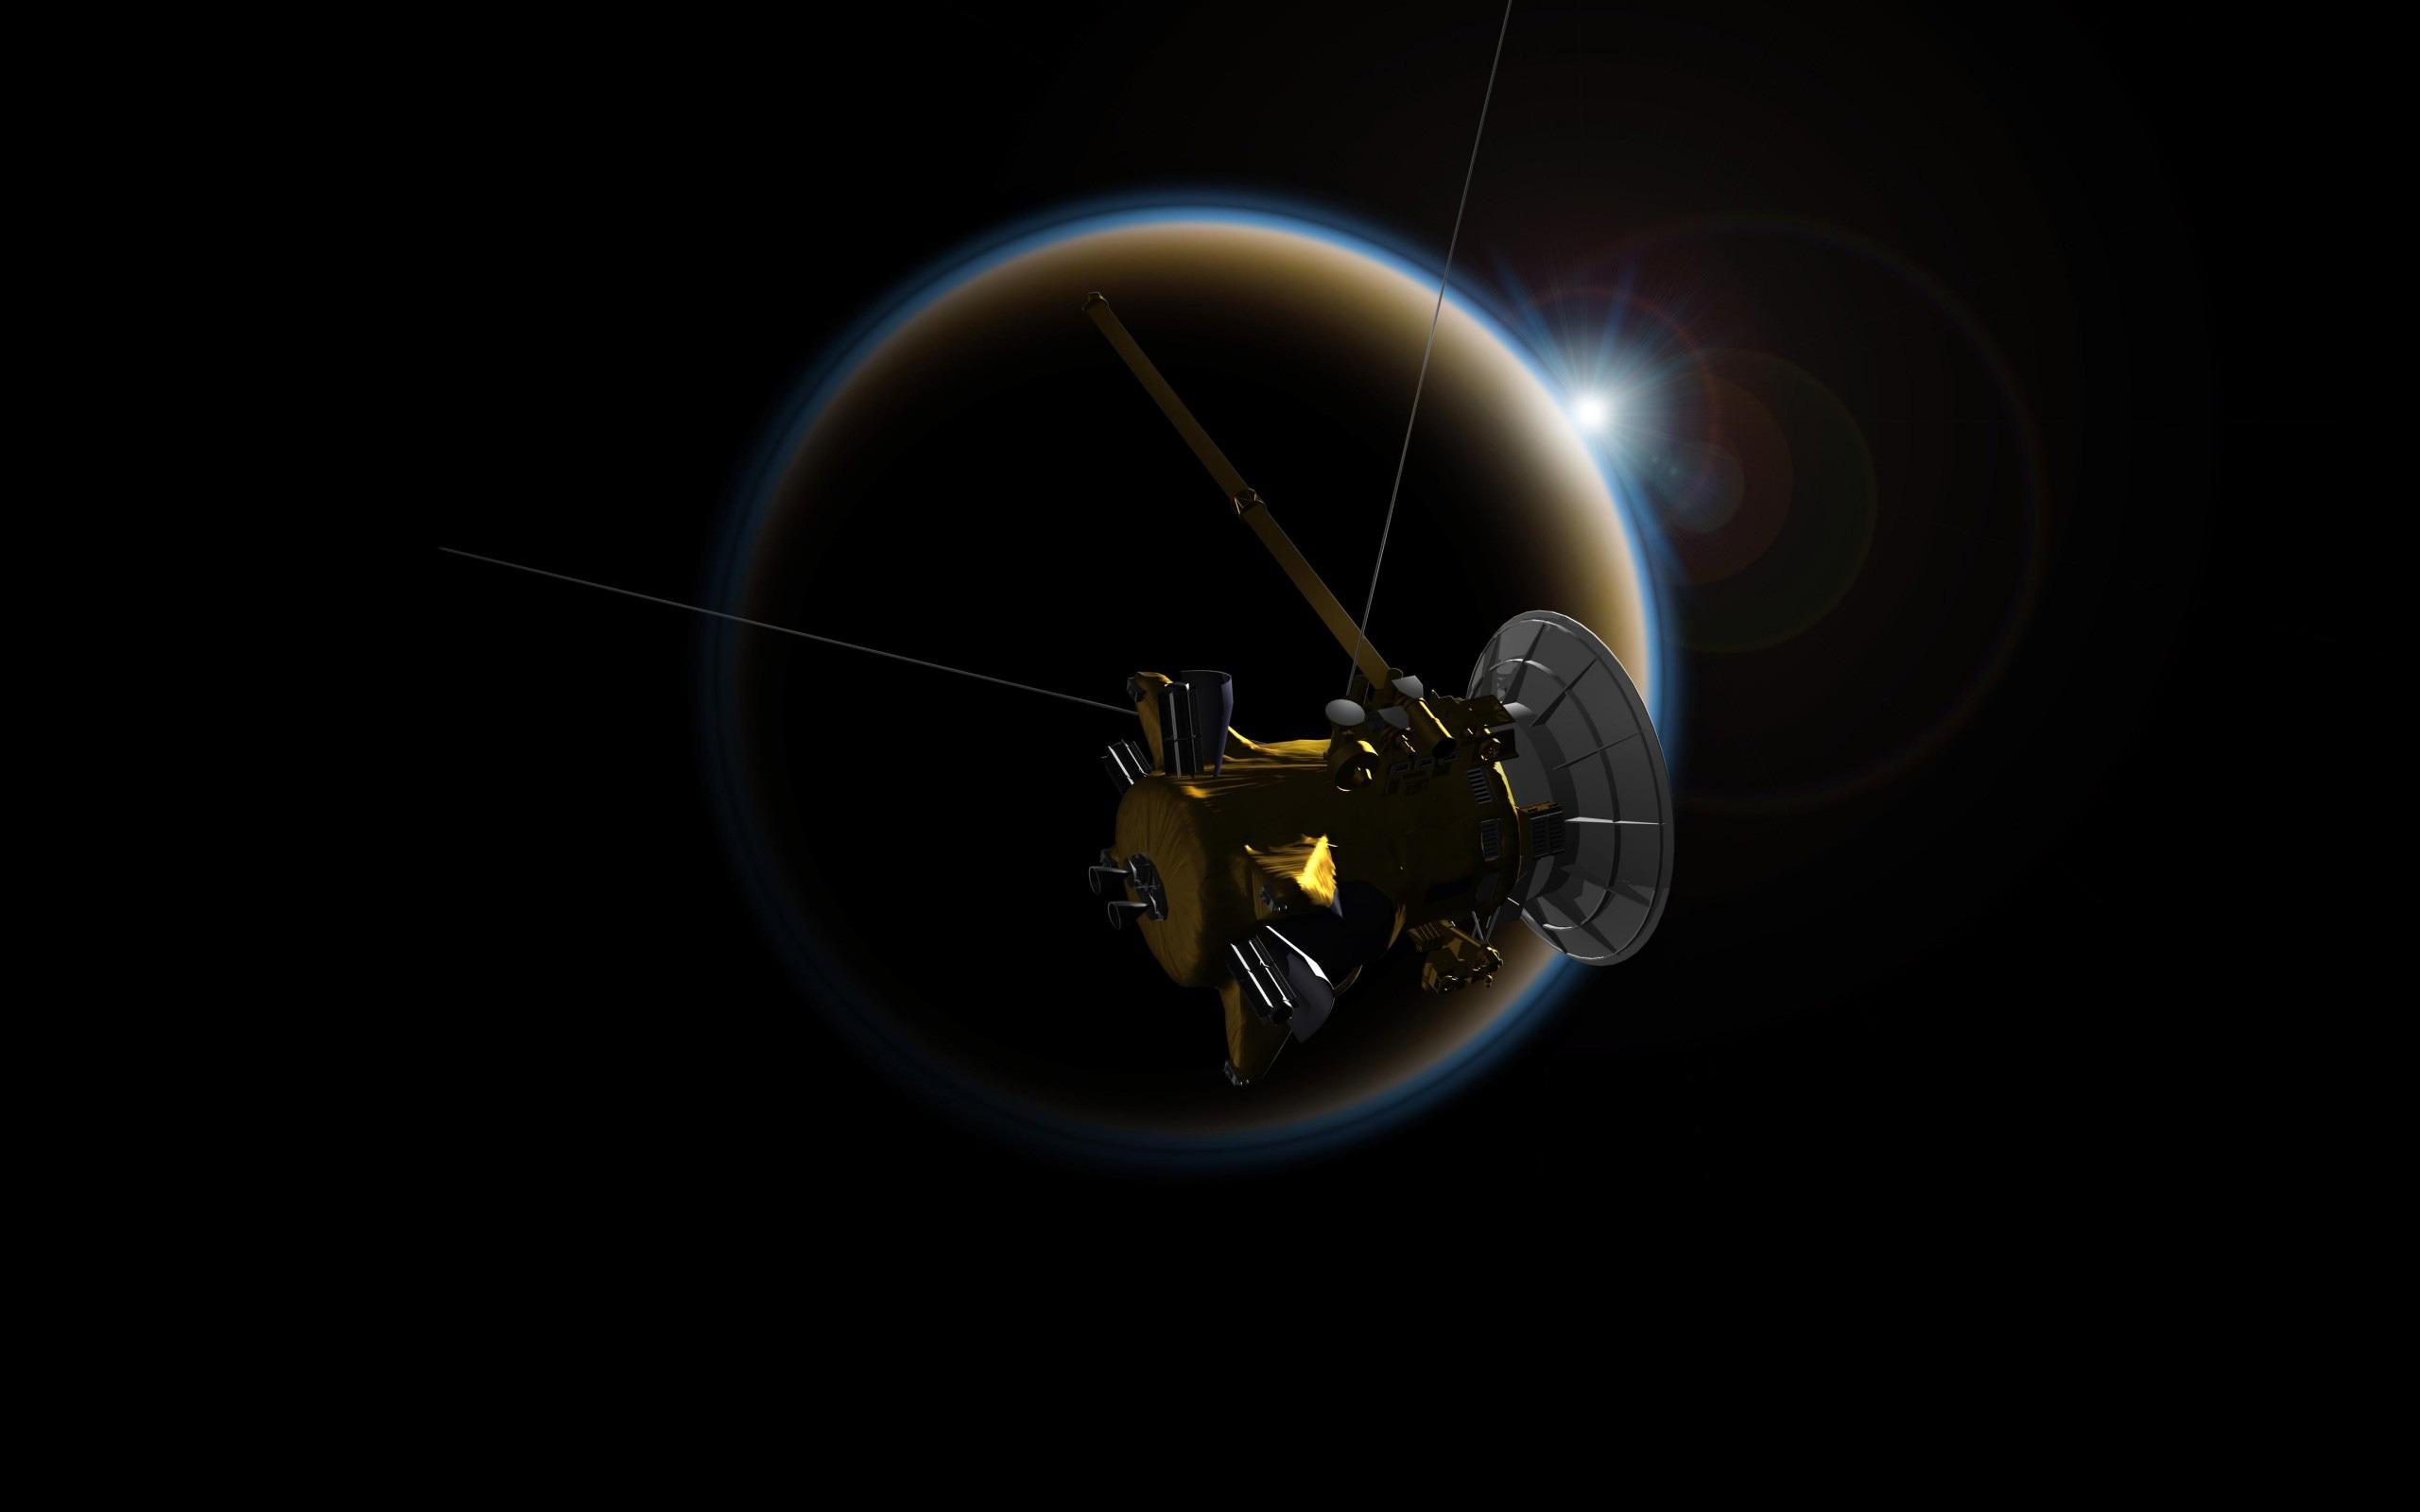 Saturn Cassini Probe Universe Hd Wallpapers Avance